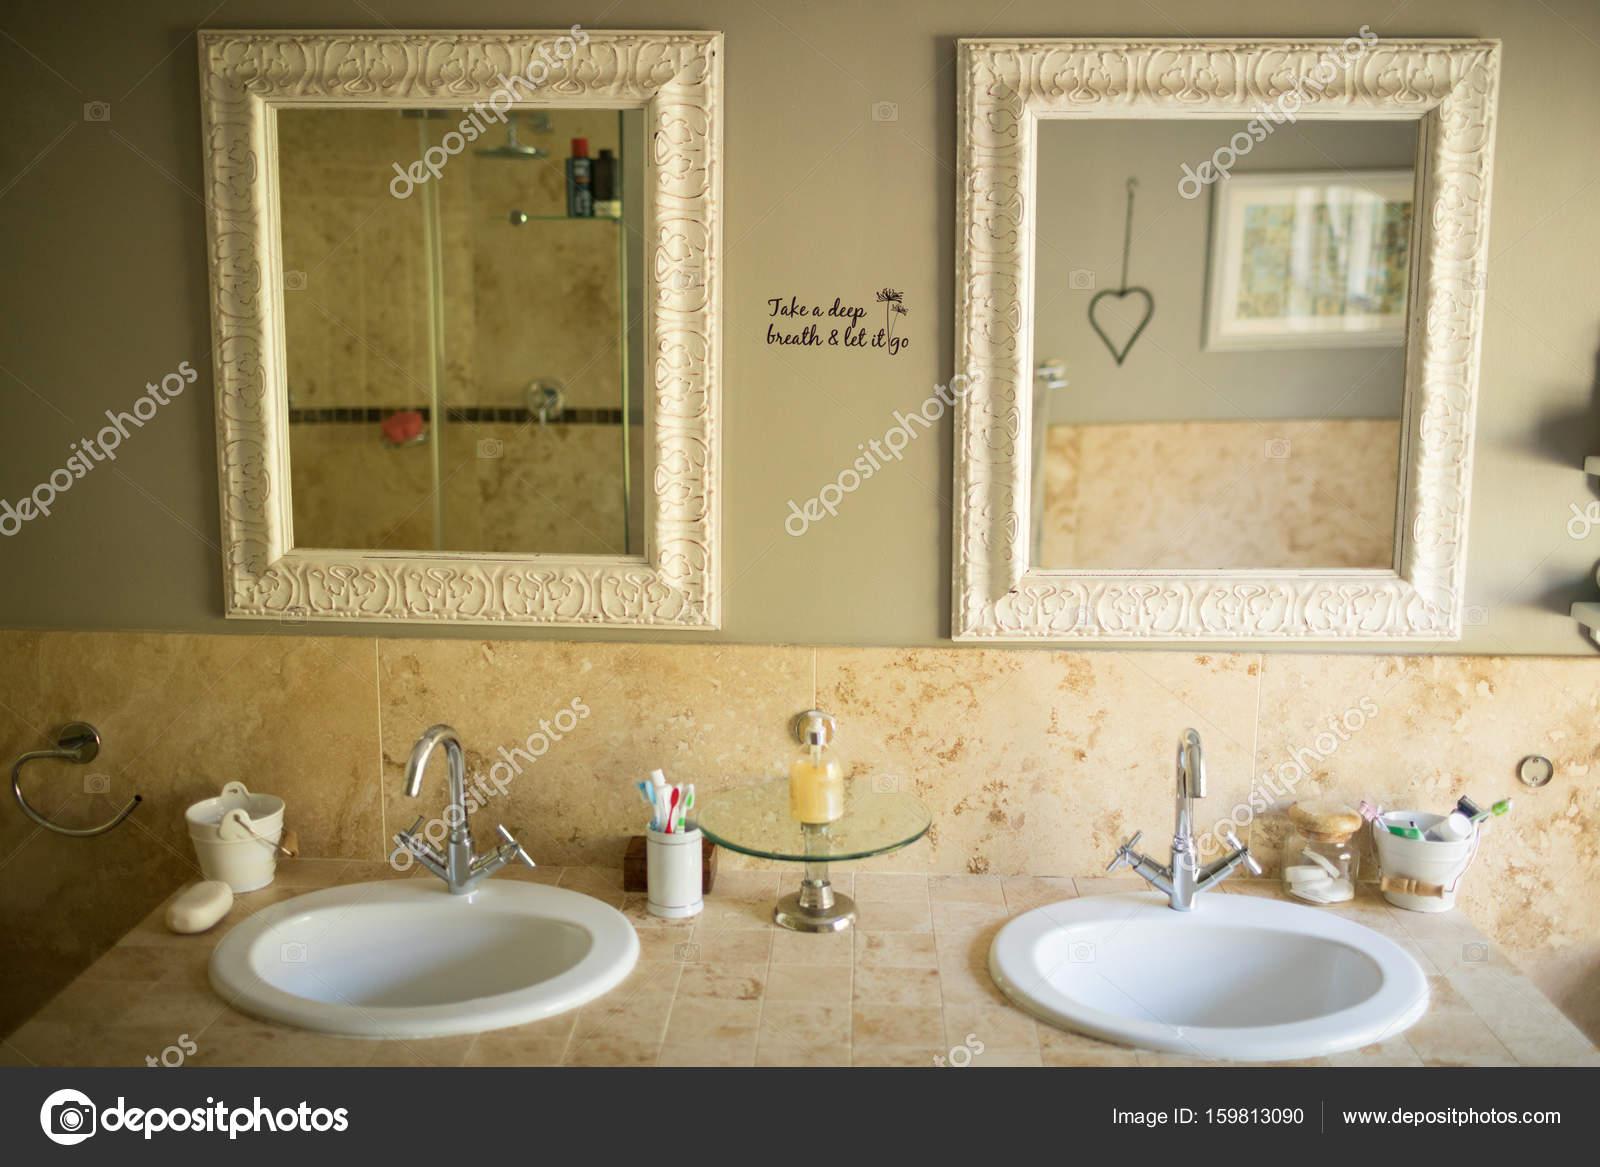 Spiegel over wastafels in de badkamer u stockfoto wavebreakmedia